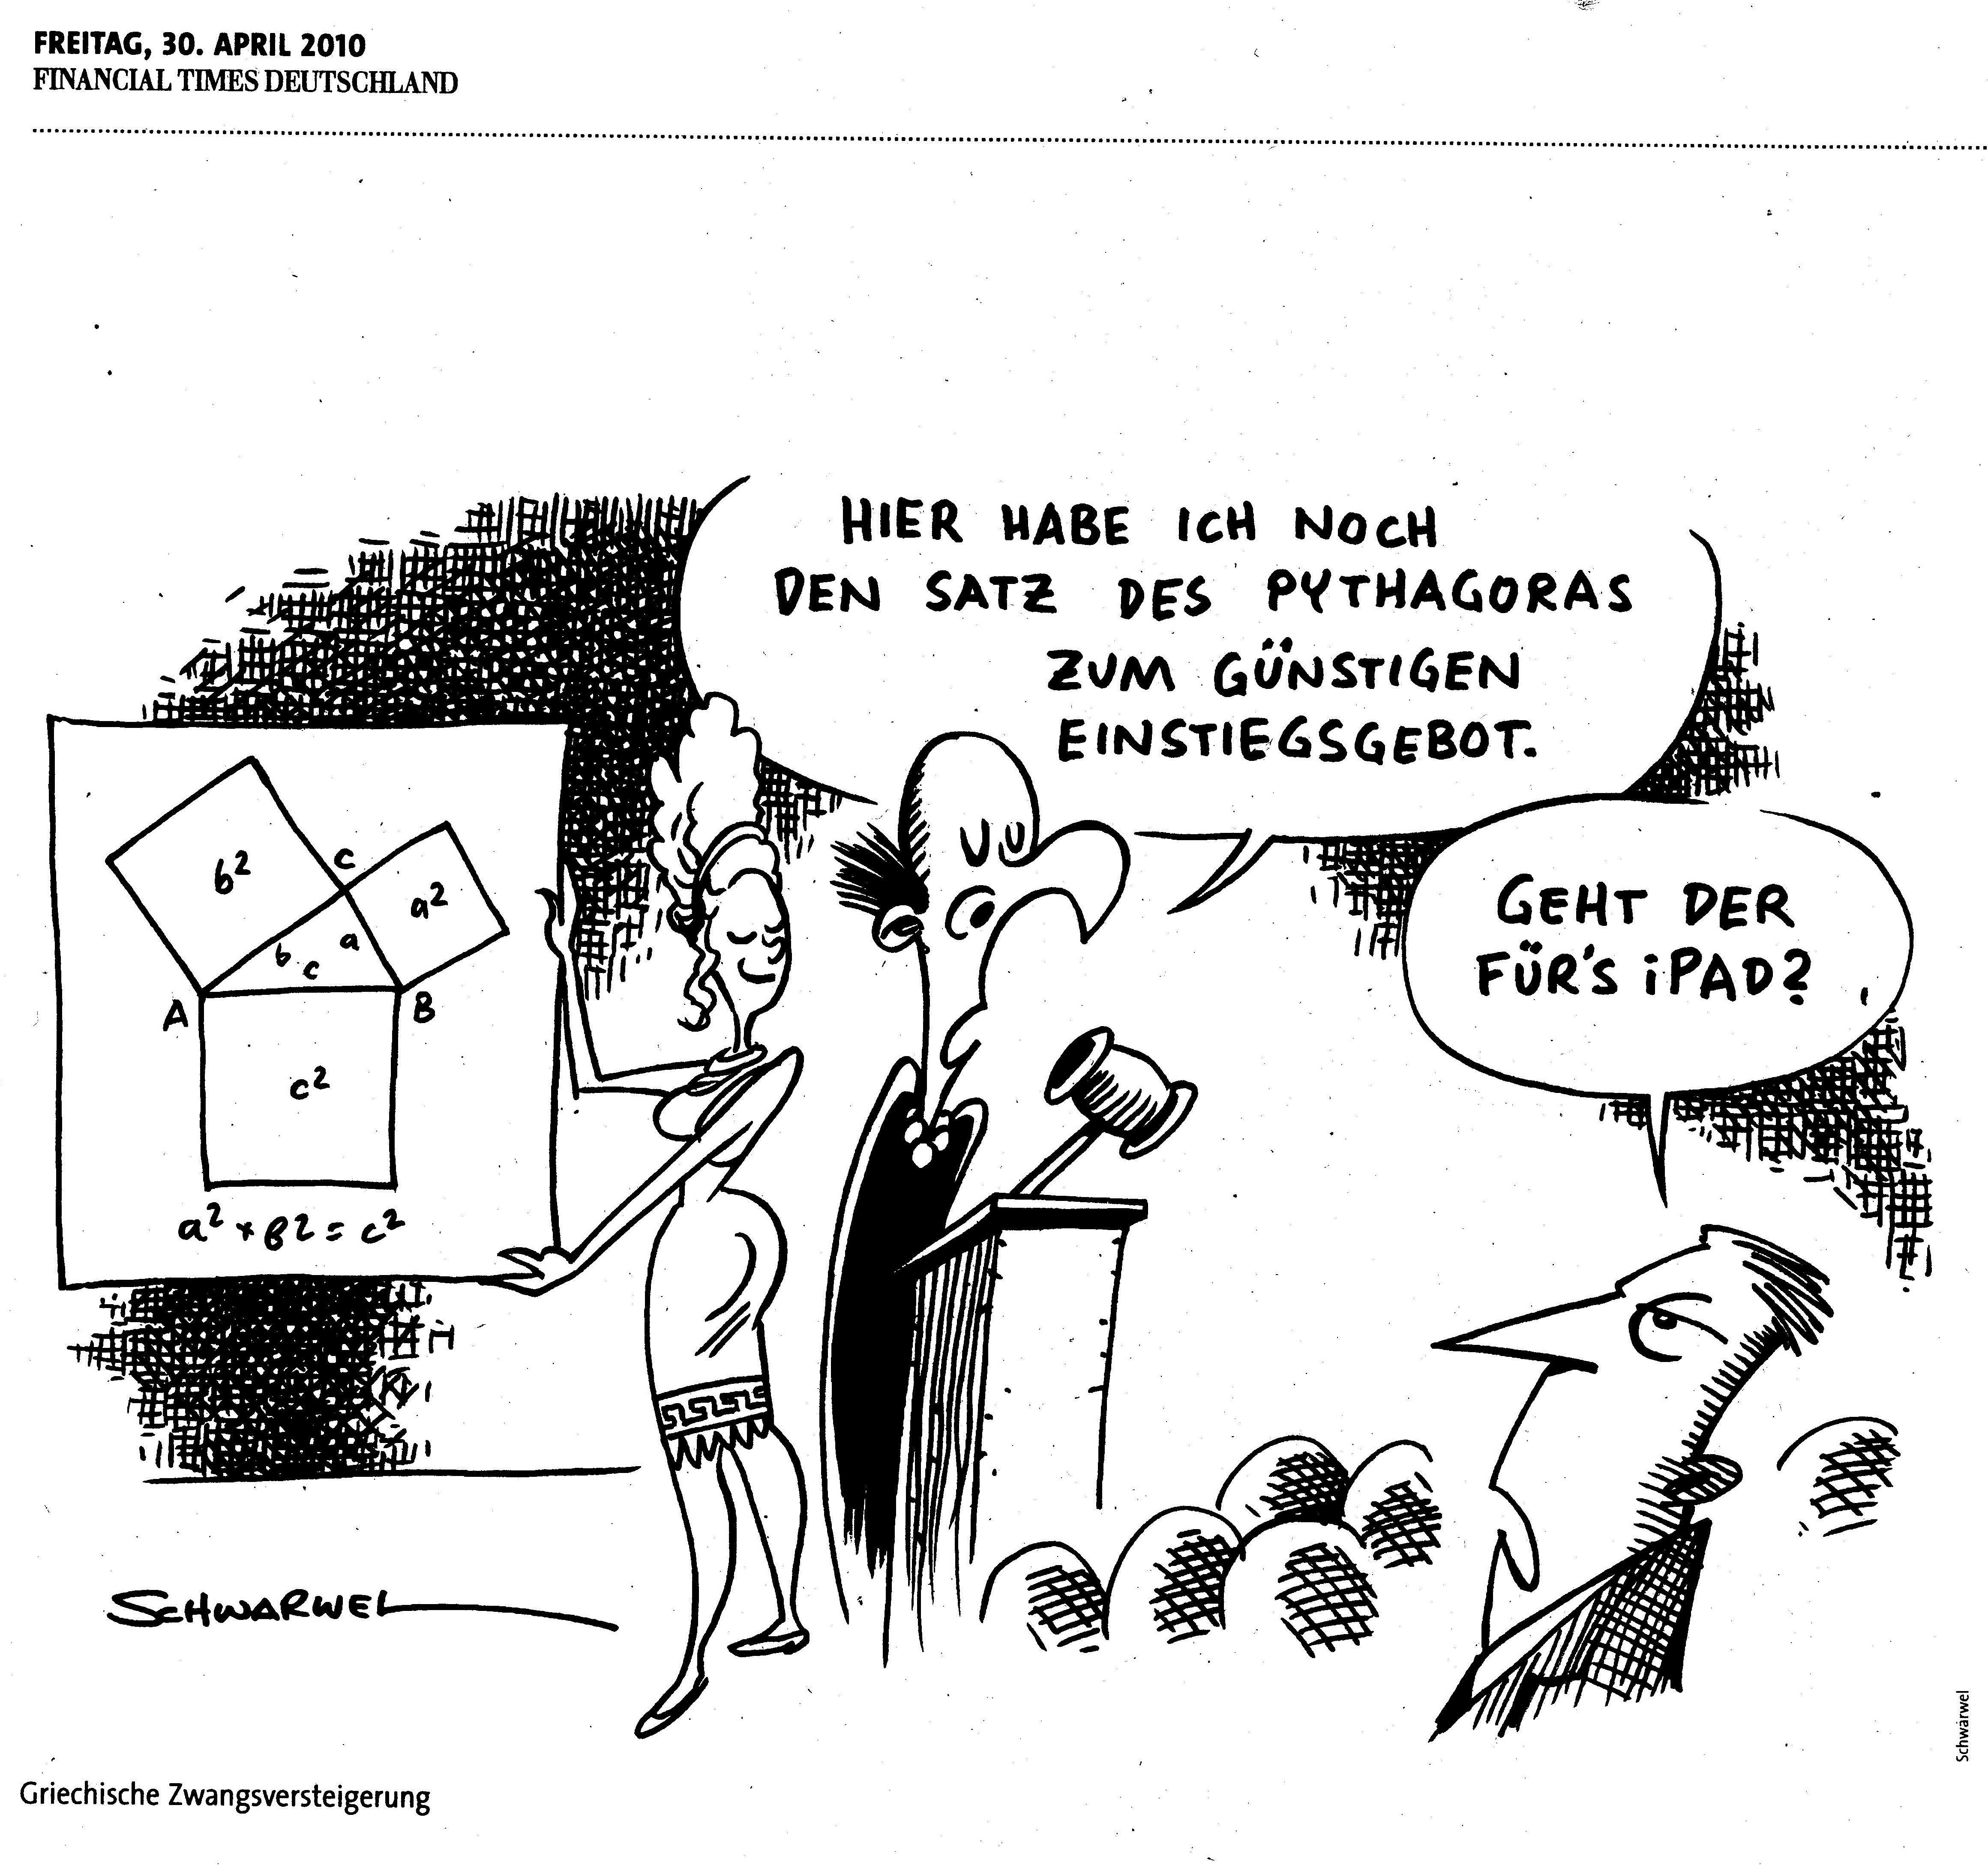 Versteigerung Pythagoras